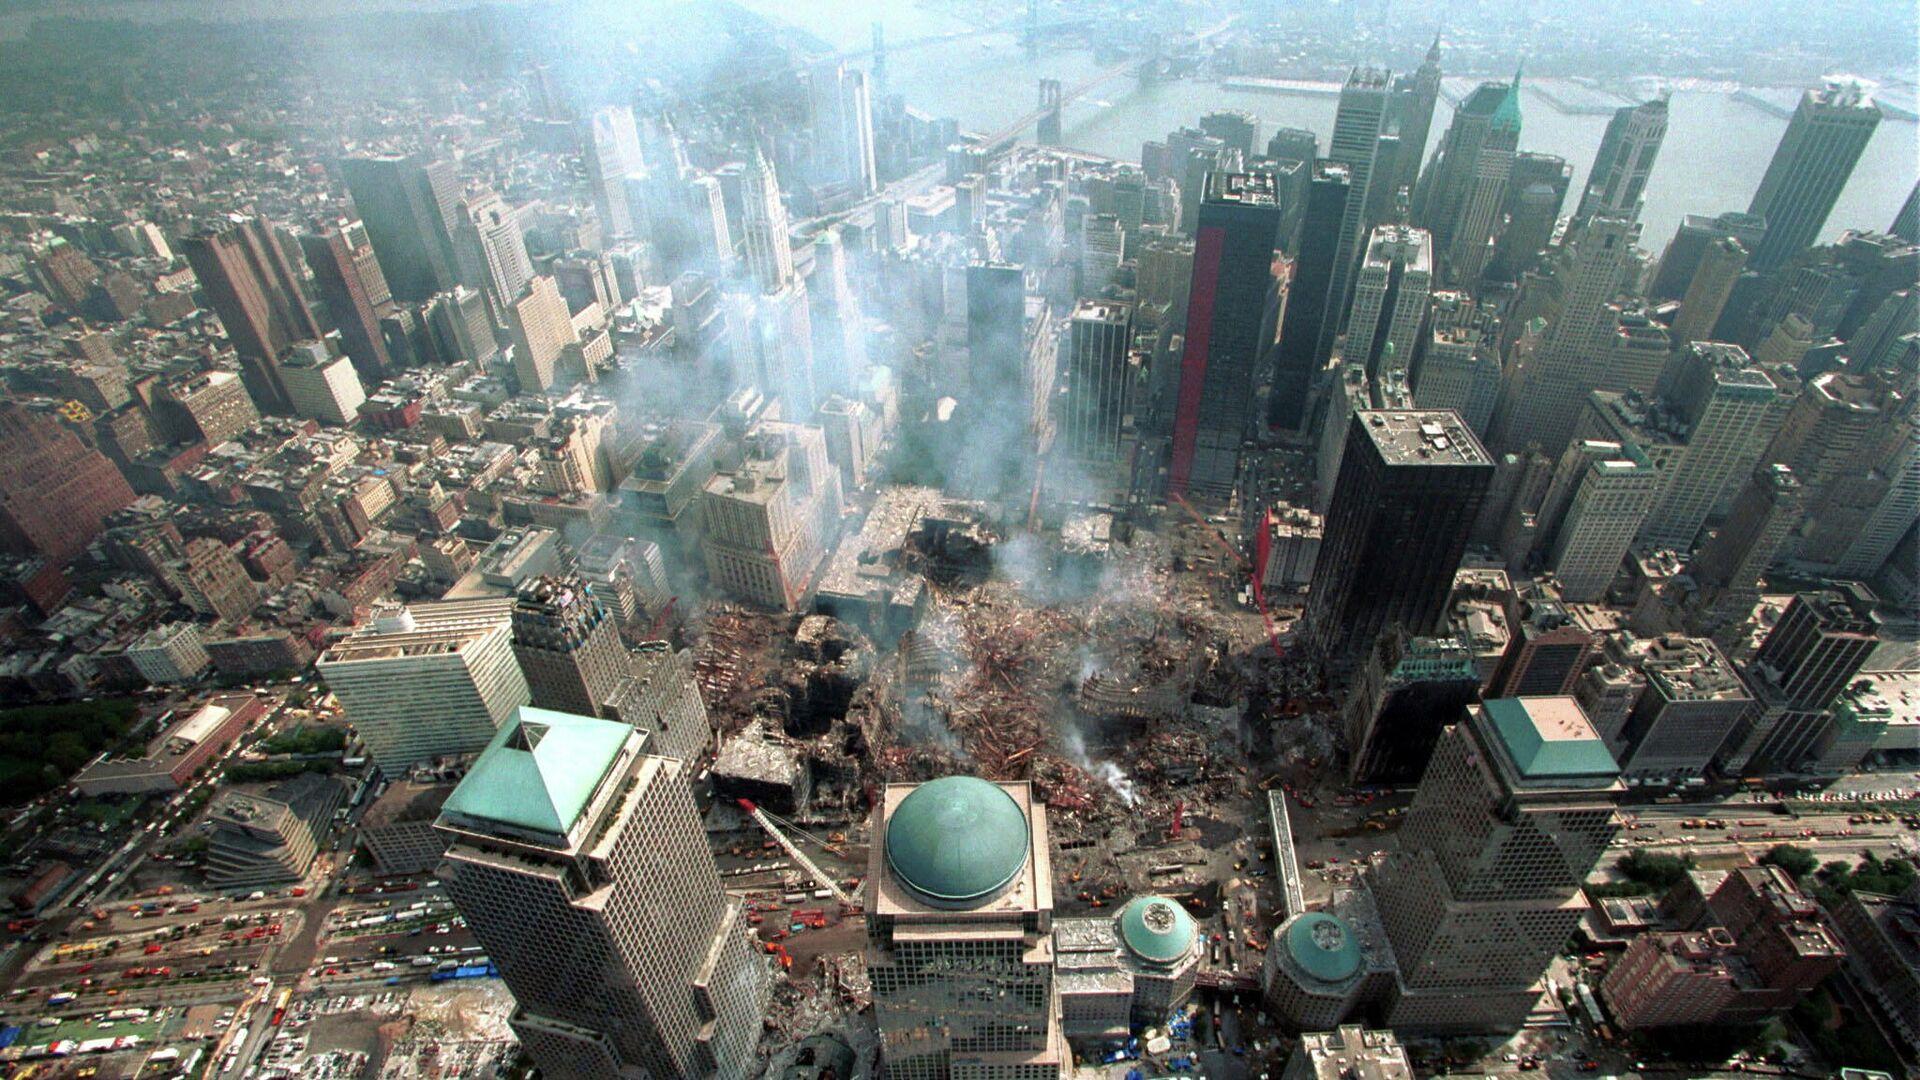 Ground Zero (Archivbild) - SNA, 1920, 11.09.2021